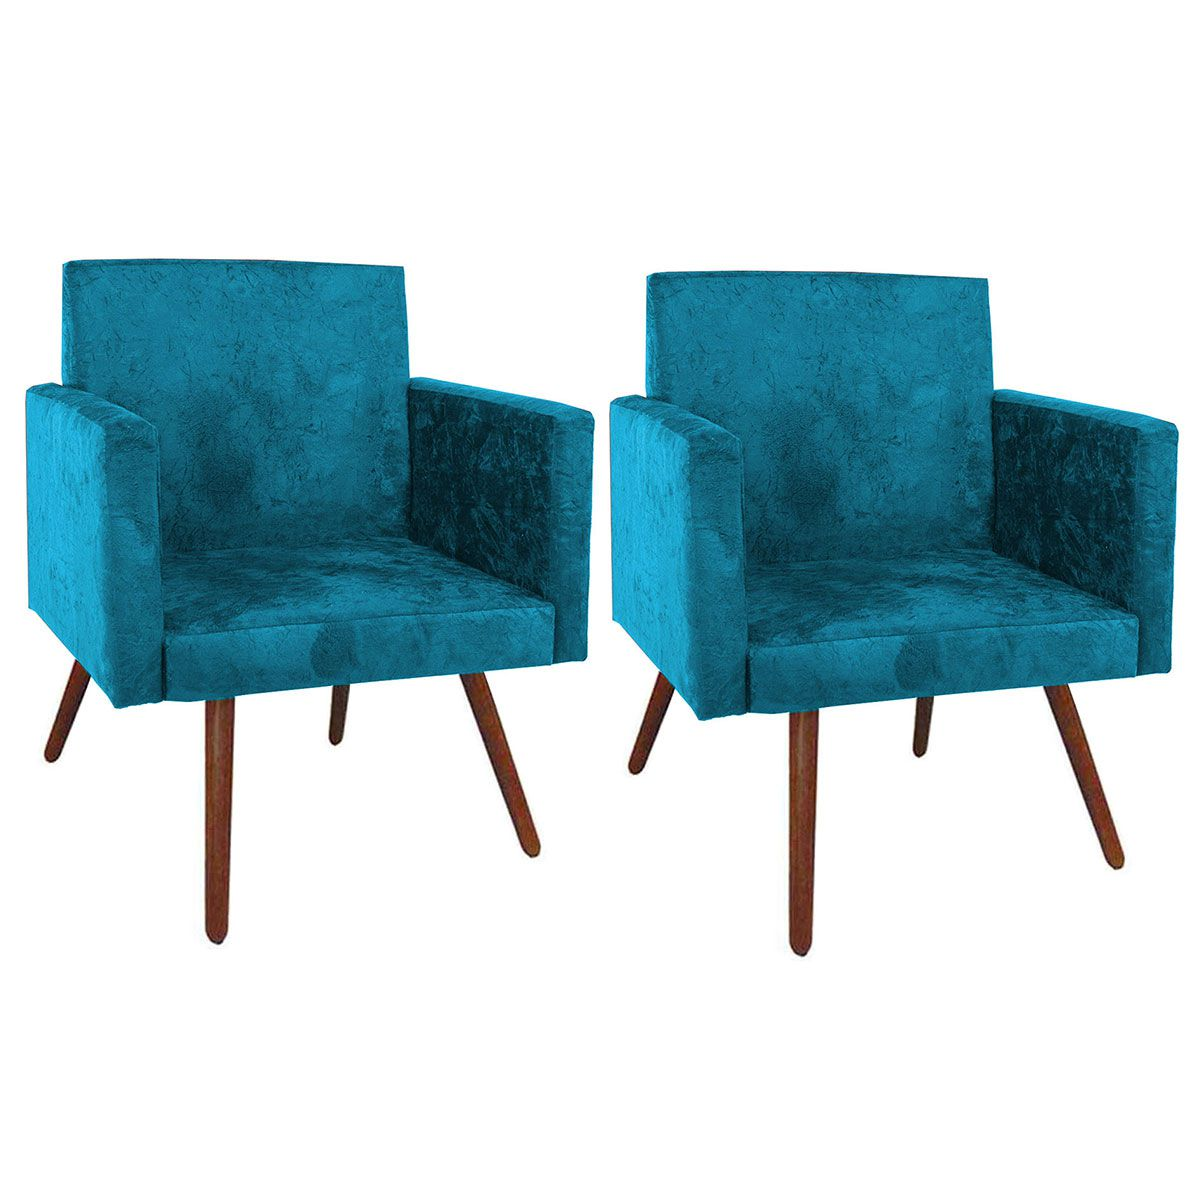 Kit 2 Poltronas Decorativa Nina Luxo Pés Palito Azul Turquesa